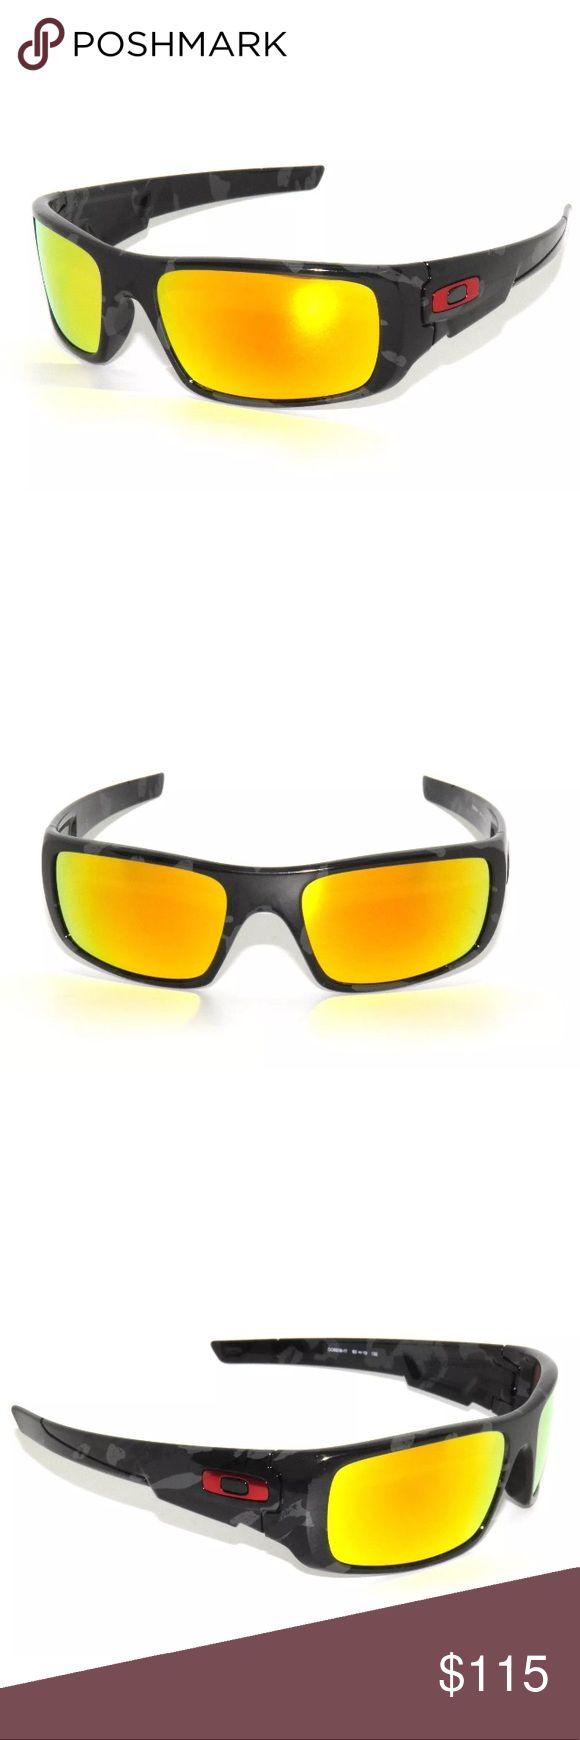 Oakley Crankshaft 9239-11 Camo Sunglasses Excellent Condition, comes with Oakley pouch. SIZE: 60-19-132 Oakley Accessories Sunglasses